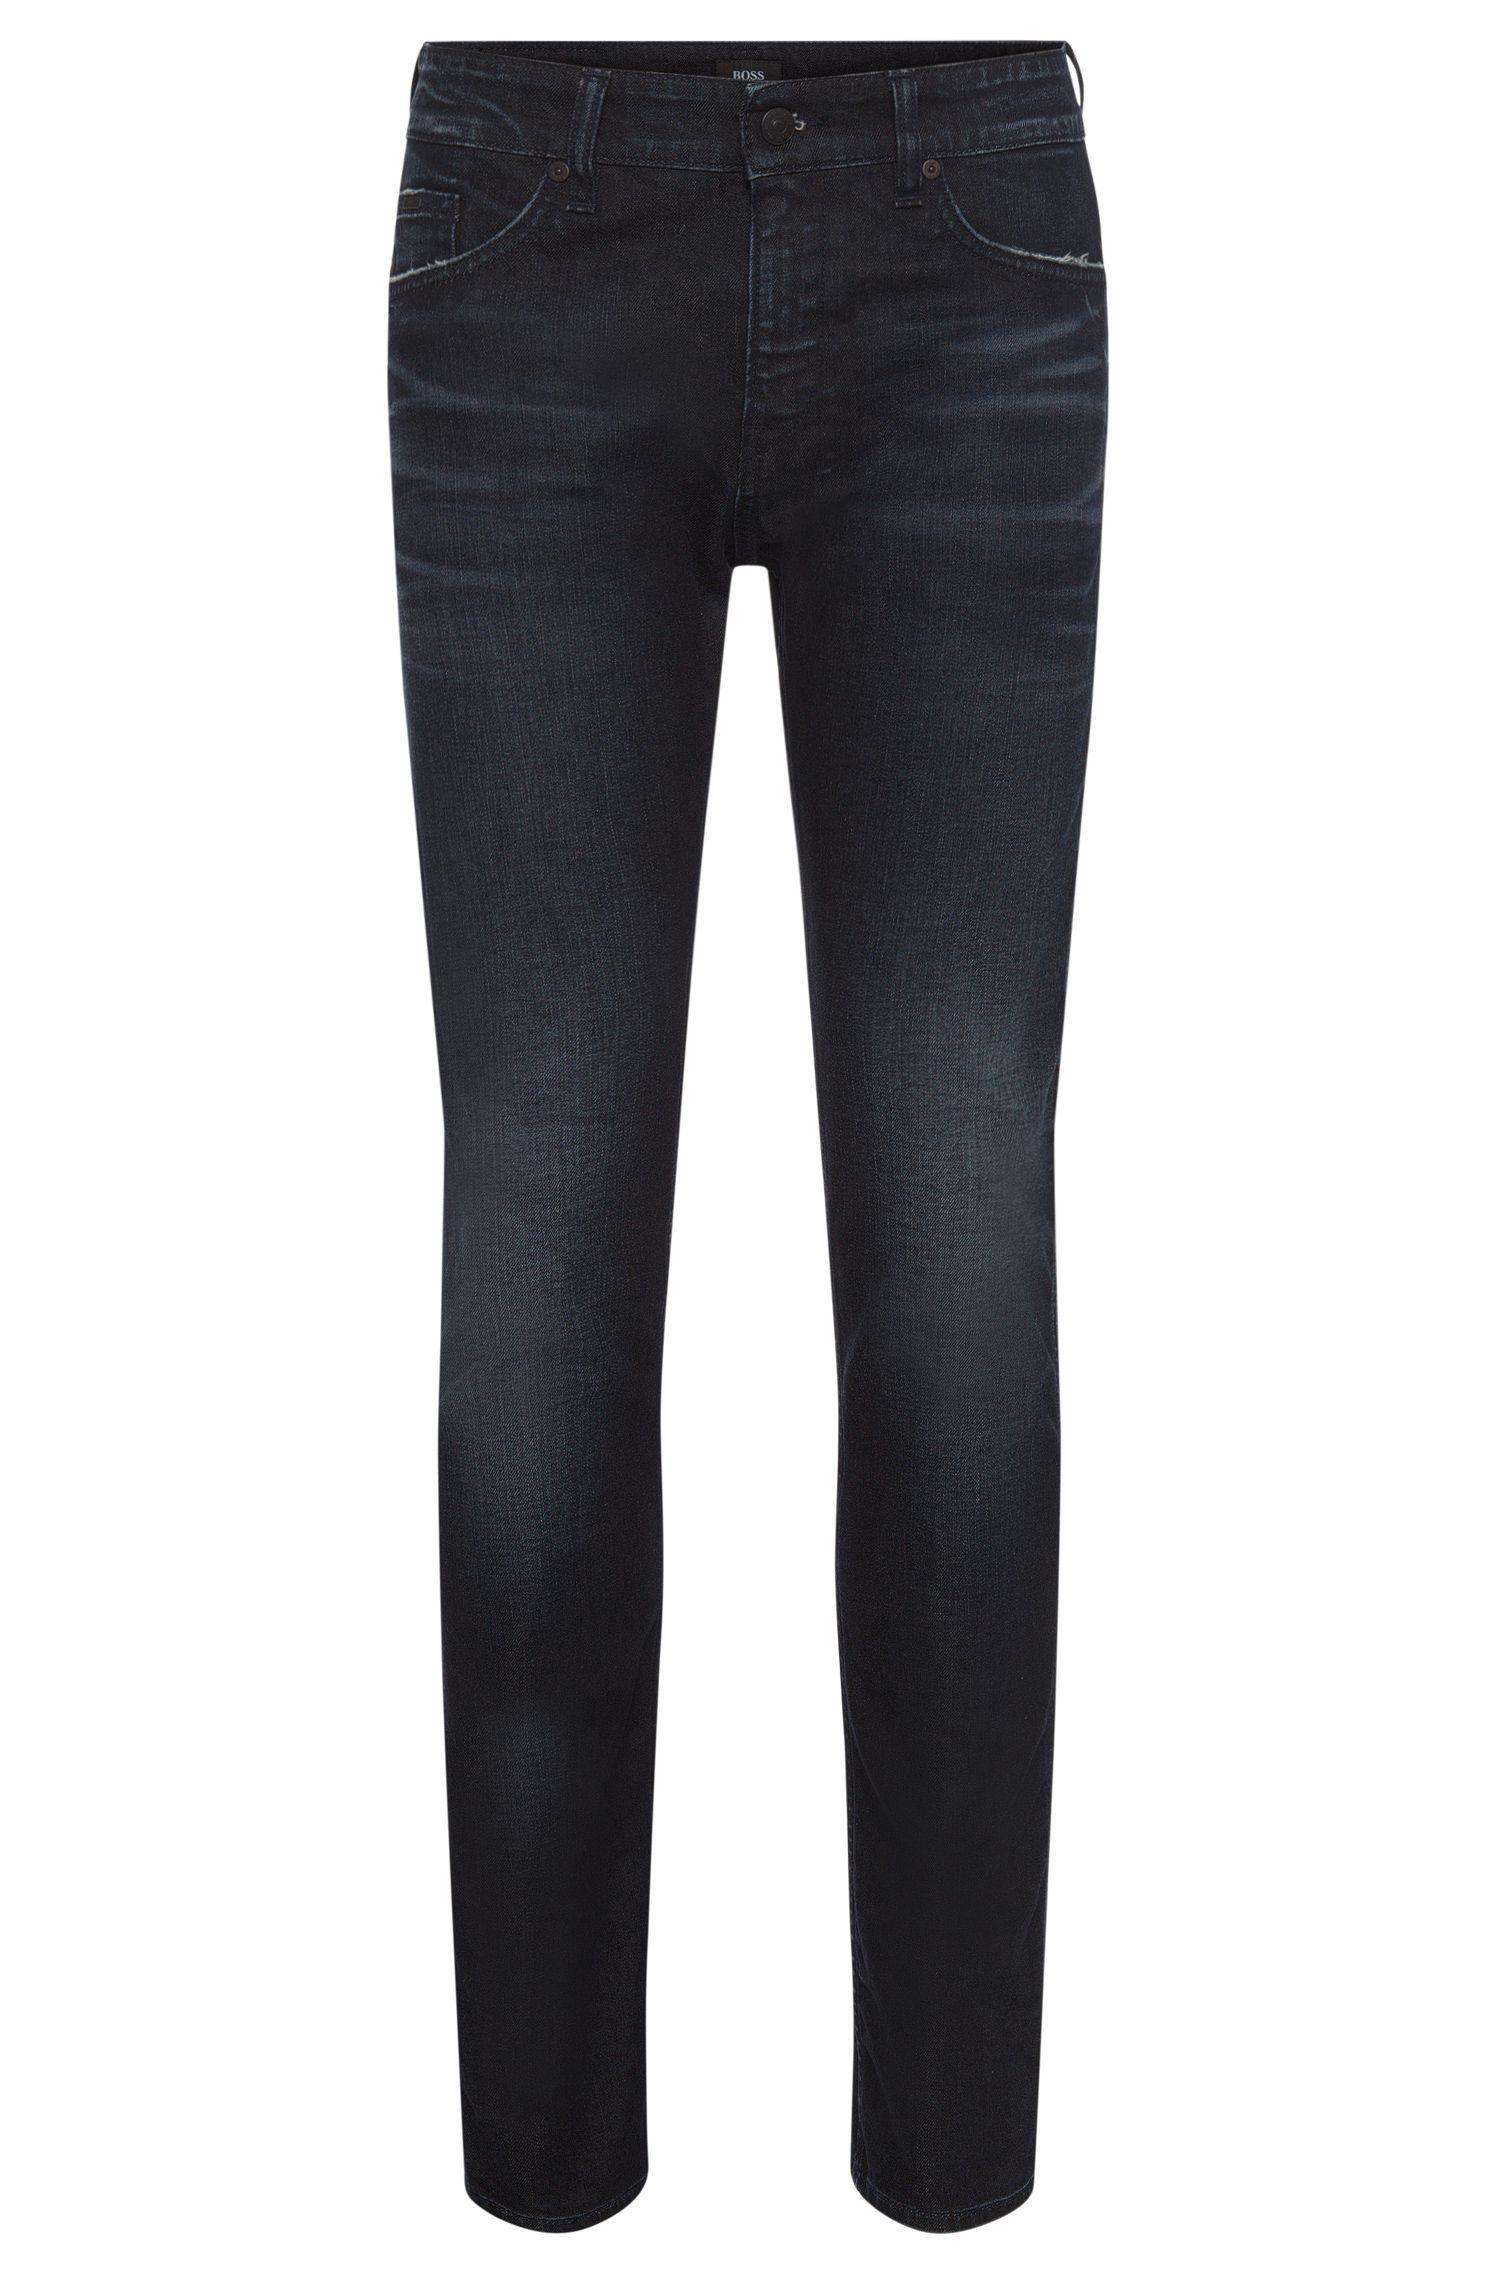 'Delaware' | Slim Fit, 11 oz Stretch Cotton Blend Jeans